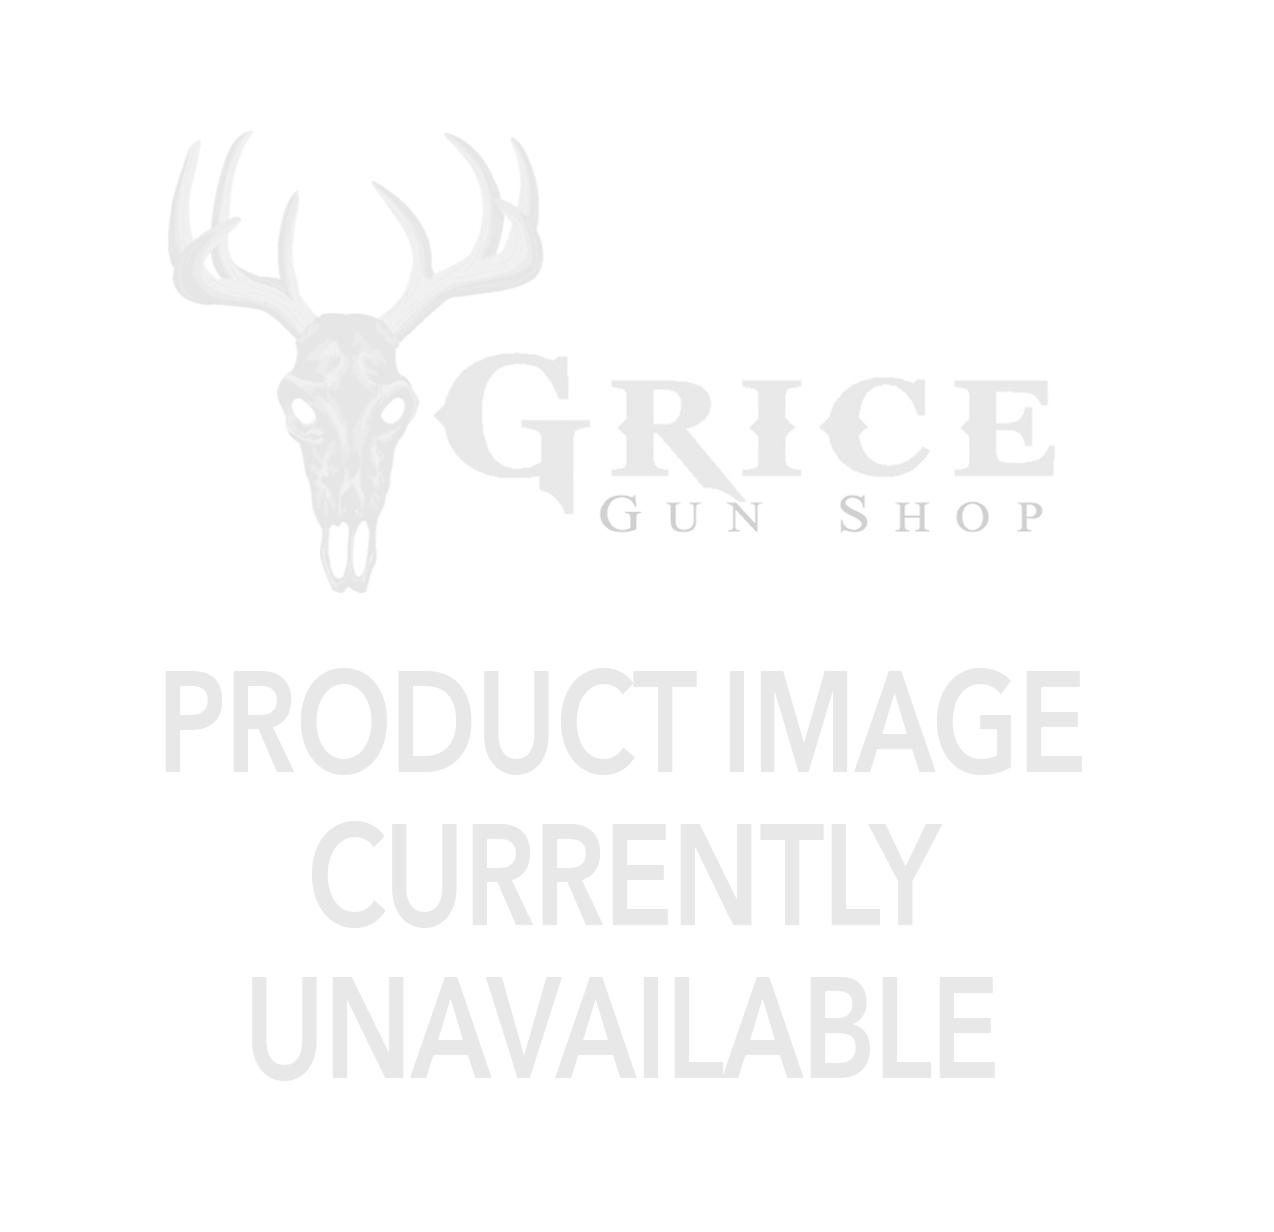 Hunter Specialties - Vita-Rack Salt Lick Block - Apple